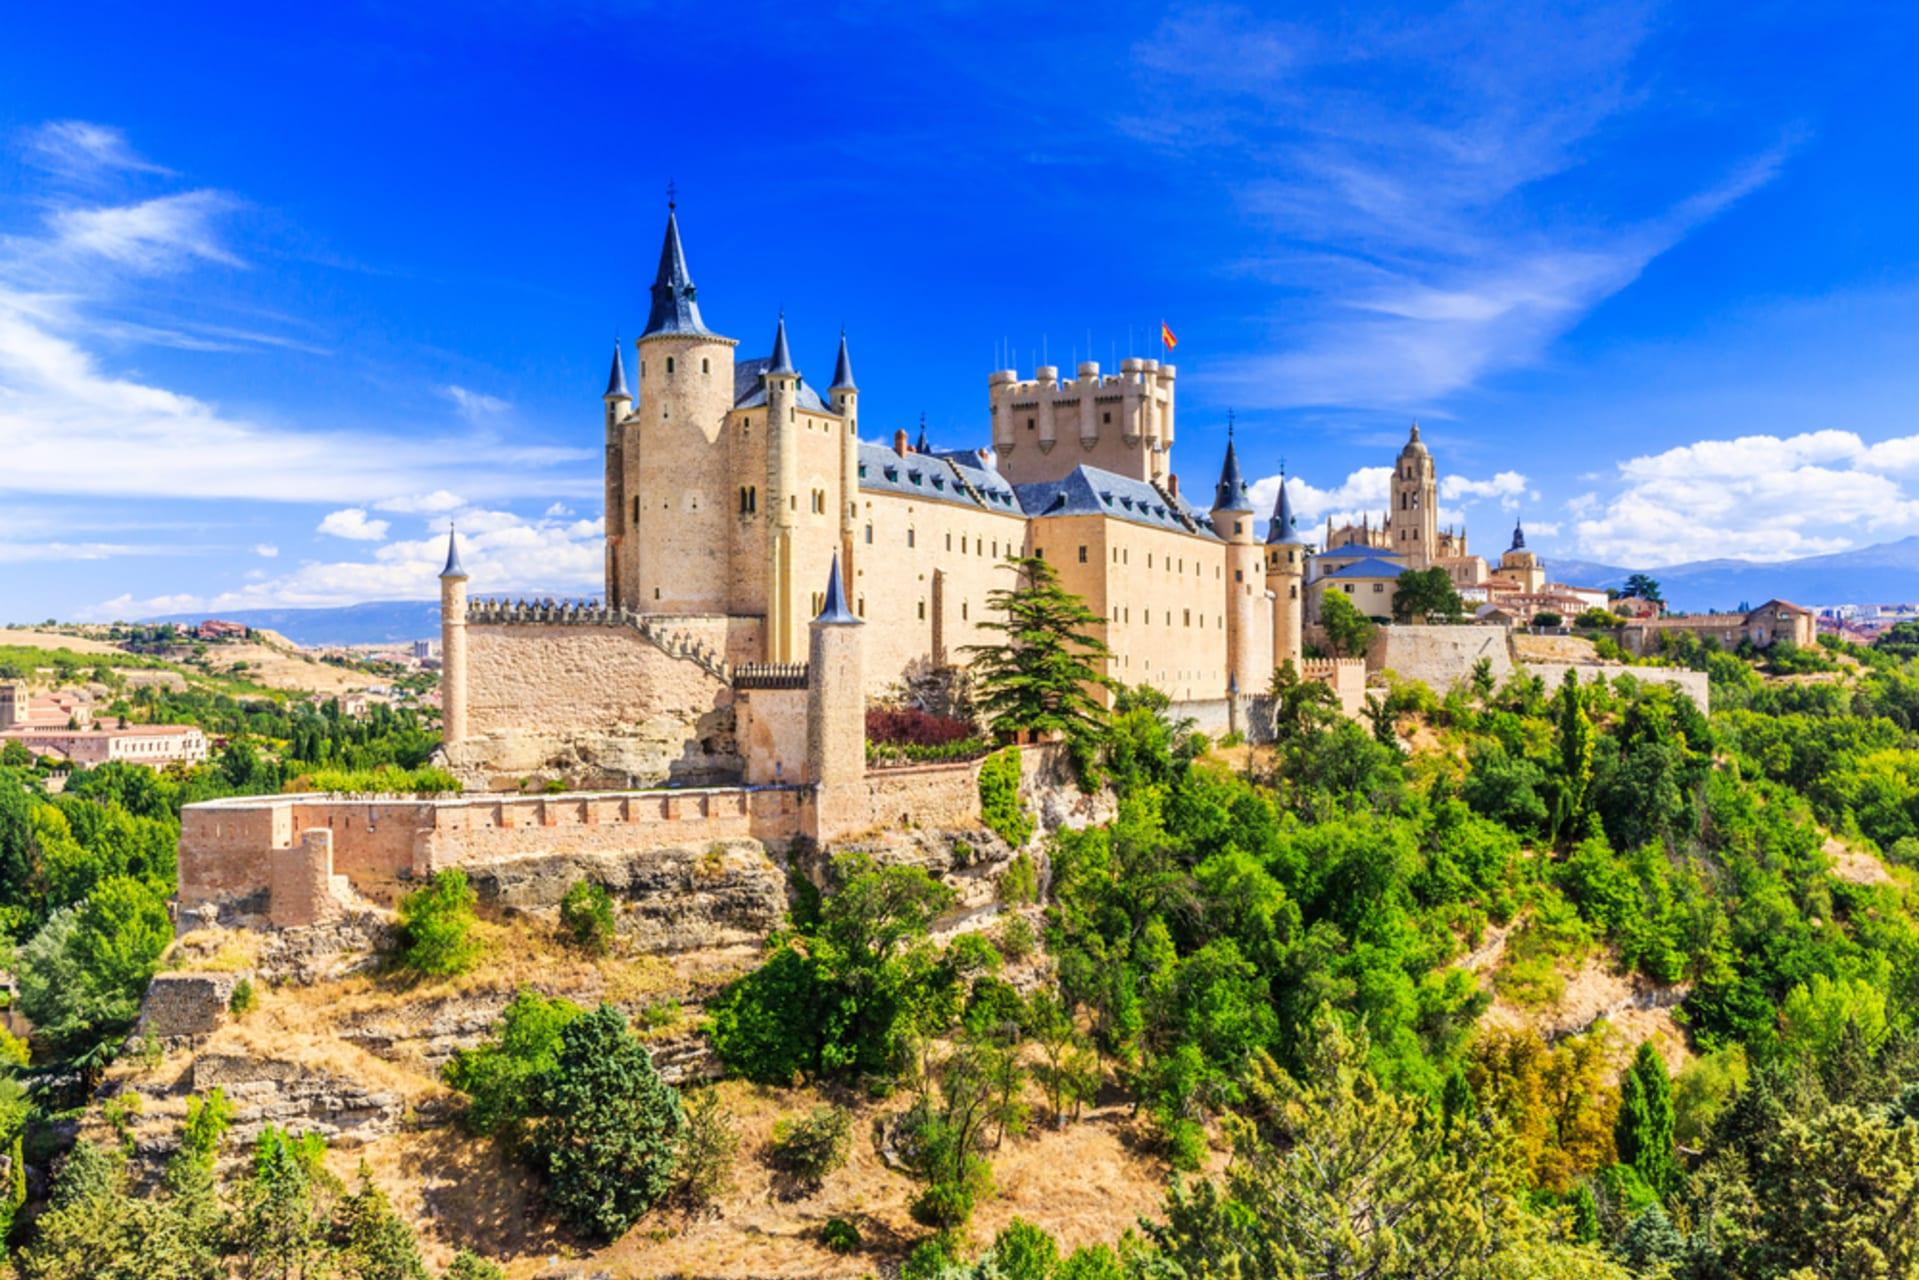 Segovia - Segovia, Nature, the River, the Dazzling Castle (Alcázar) and You